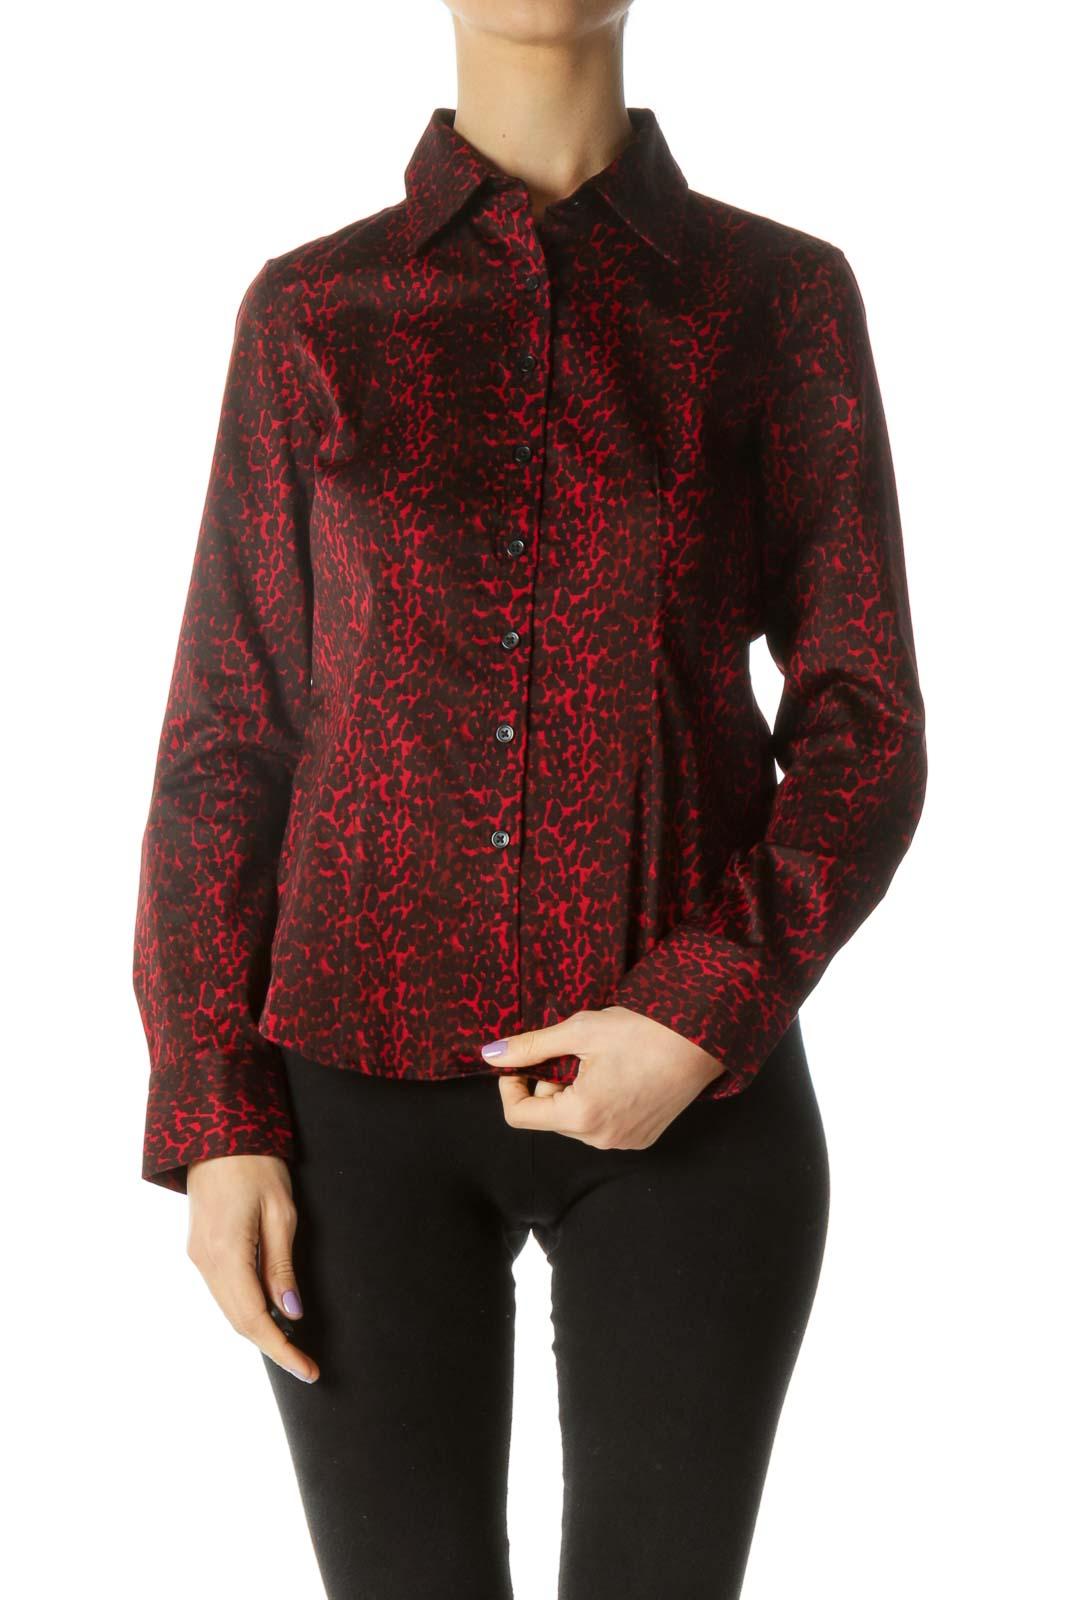 Red and Black Cheetah Print Button-down Shirt